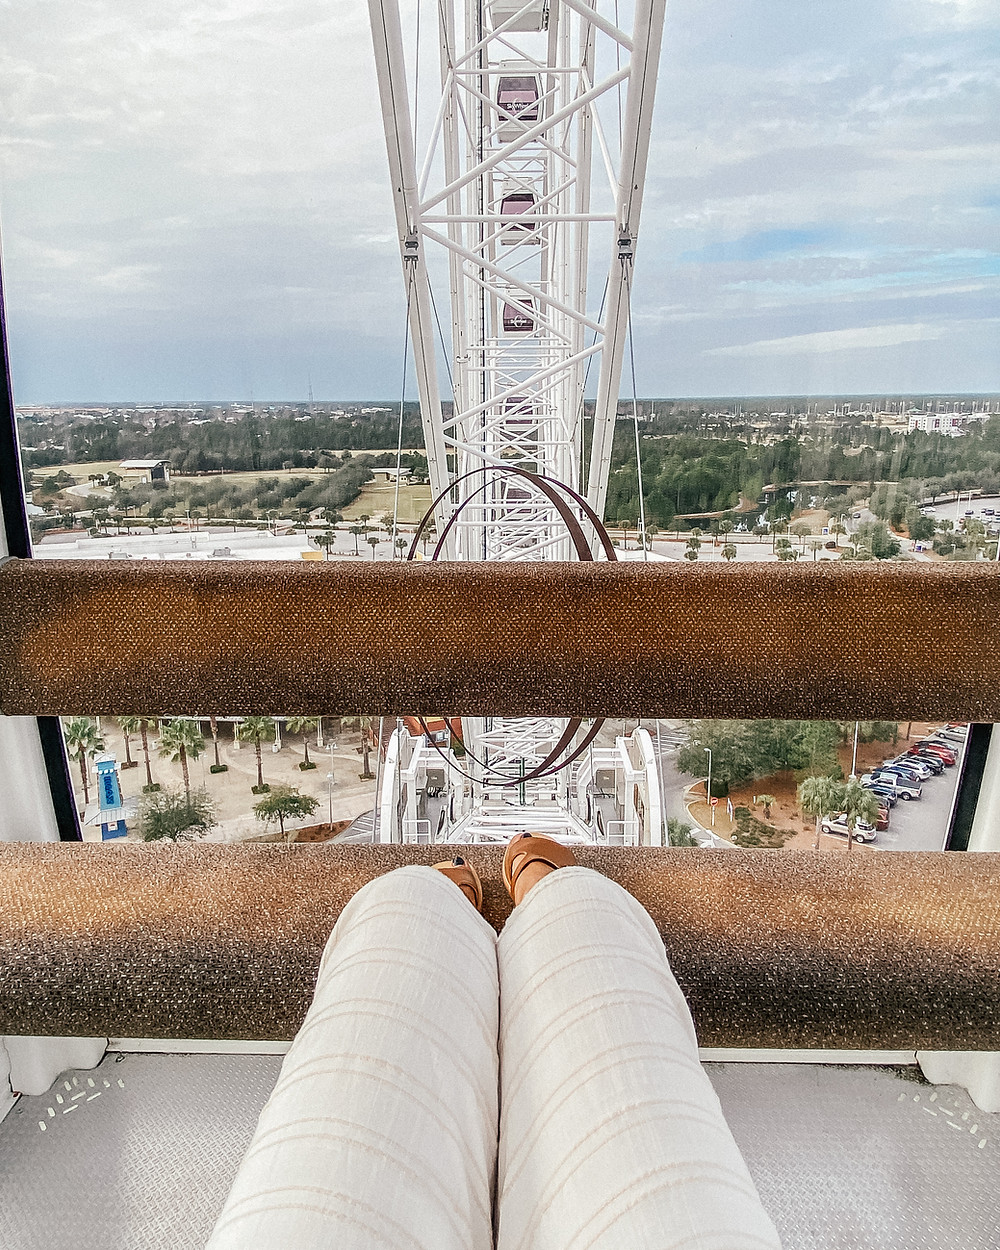 Ferris Wheel, Panama City Beach, Florida